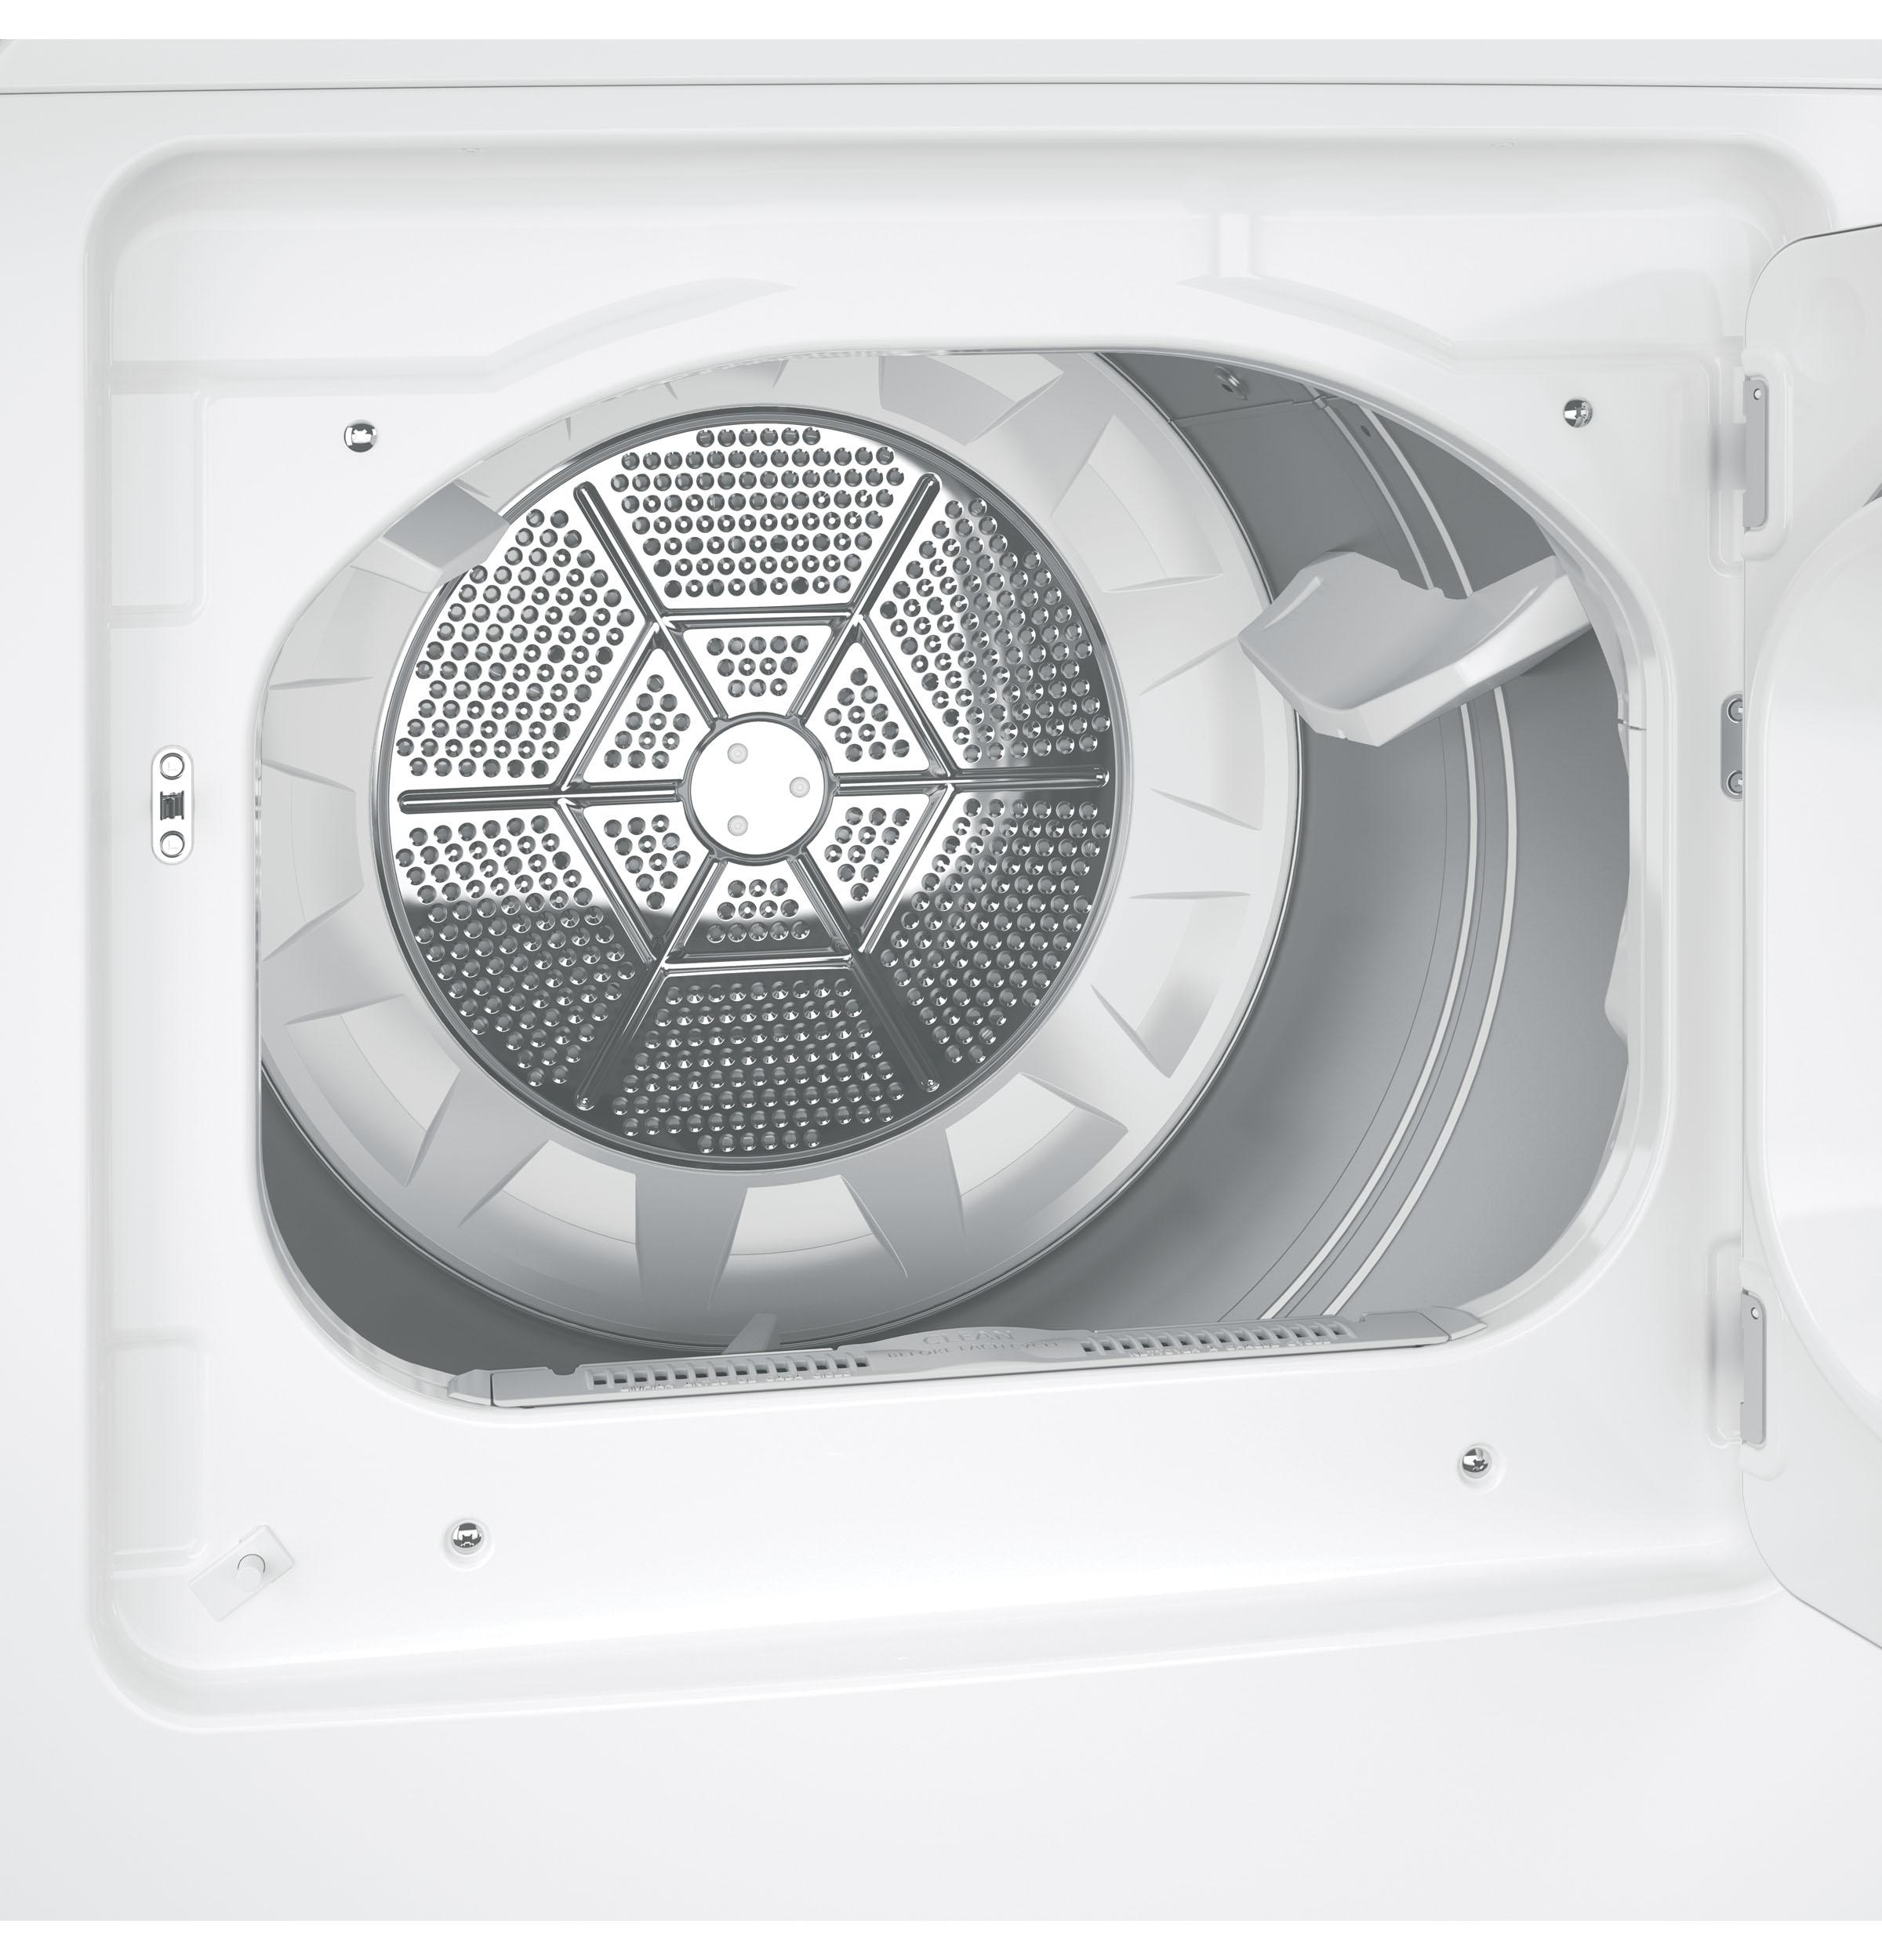 GE Appliances GTX65GBJSWS 6.1 cu. ft. Aluminized Alloy Drum Gas Dryer w/ HE Sensor Dry - White